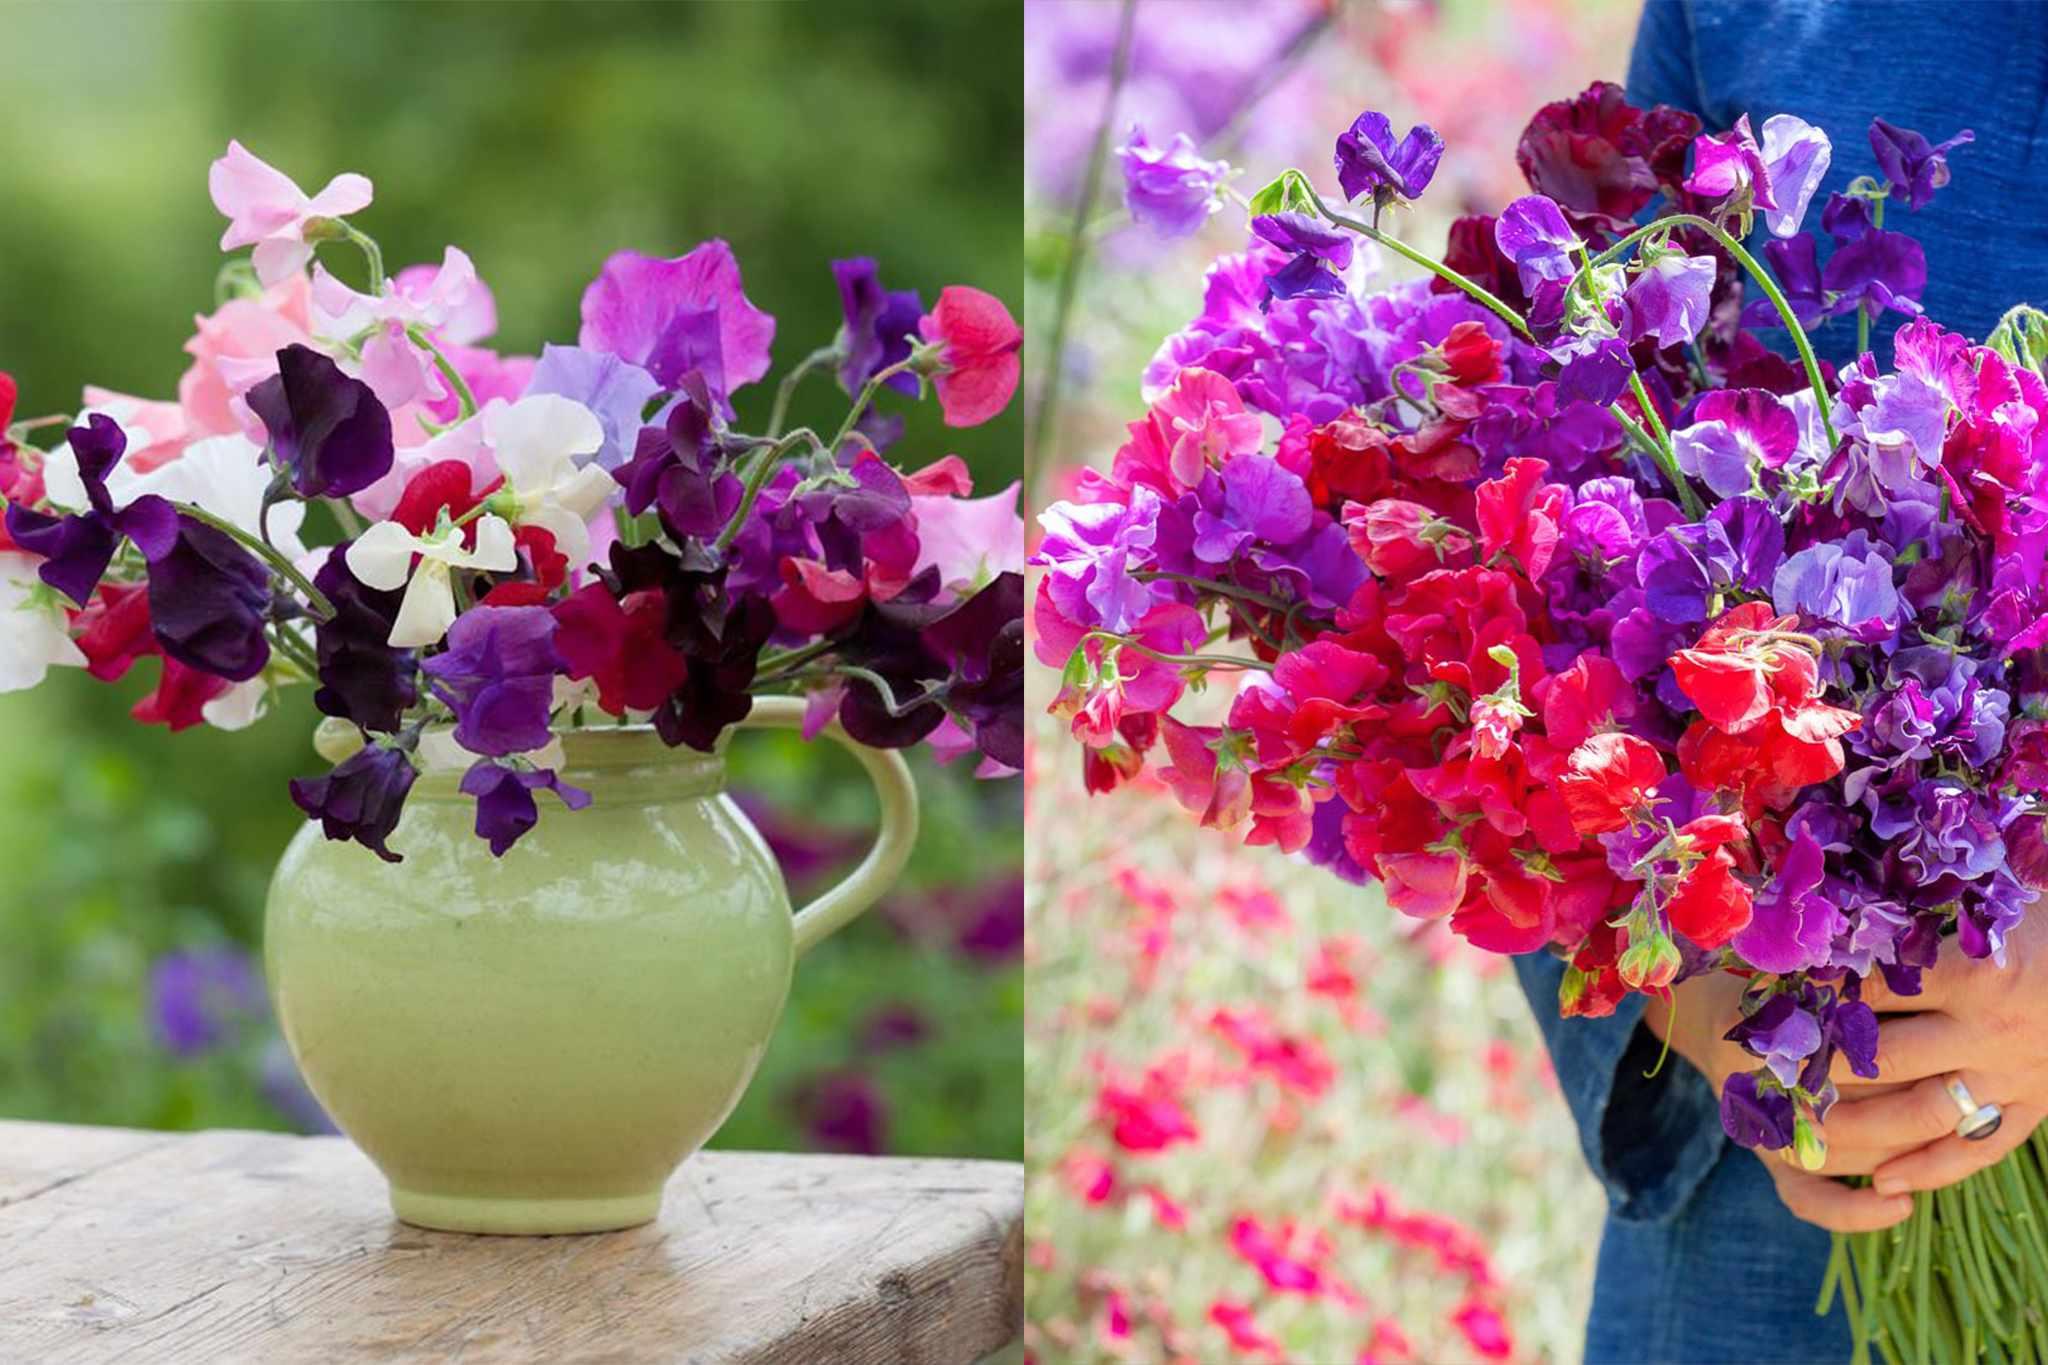 sarah-raven-free-postage-sweet-pea-seedlings_v2-2048-1365